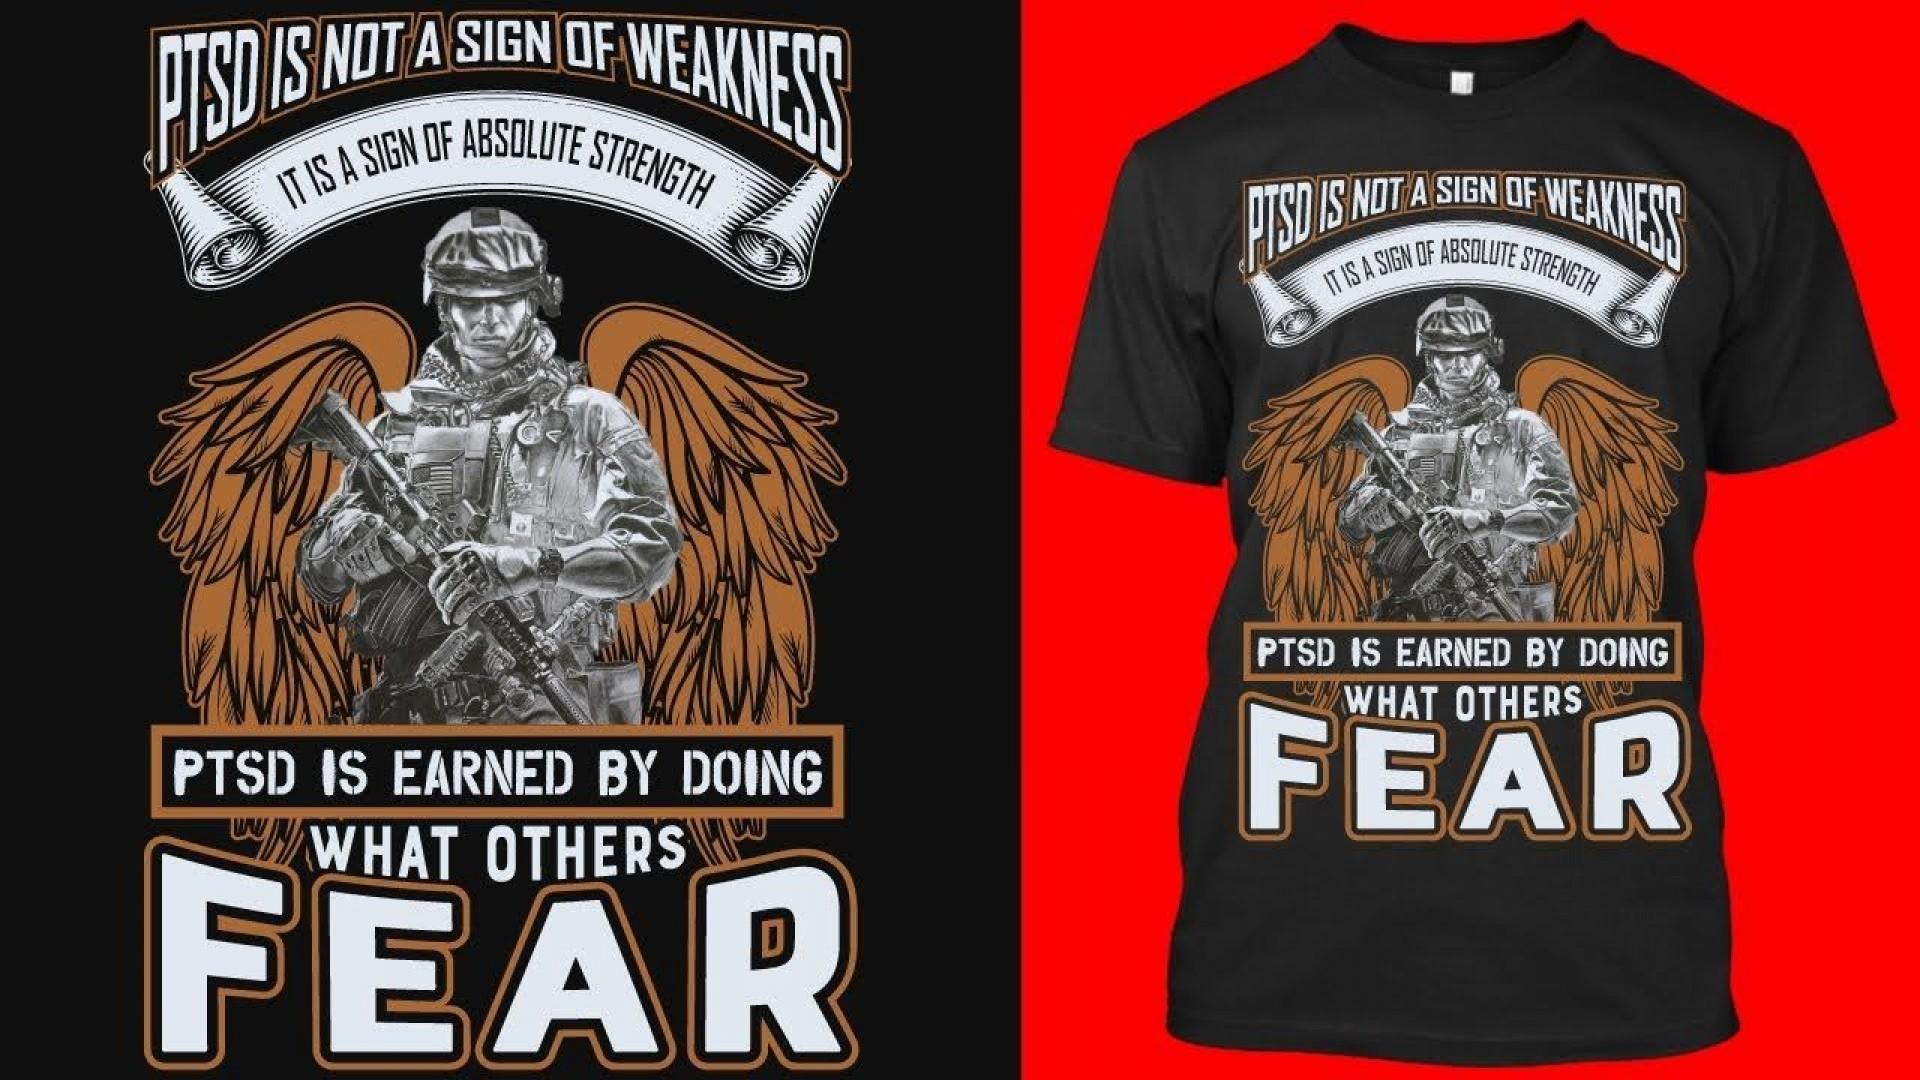 005 Outstanding T Shirt Design Template Ai Highest Clarity  Tee1920